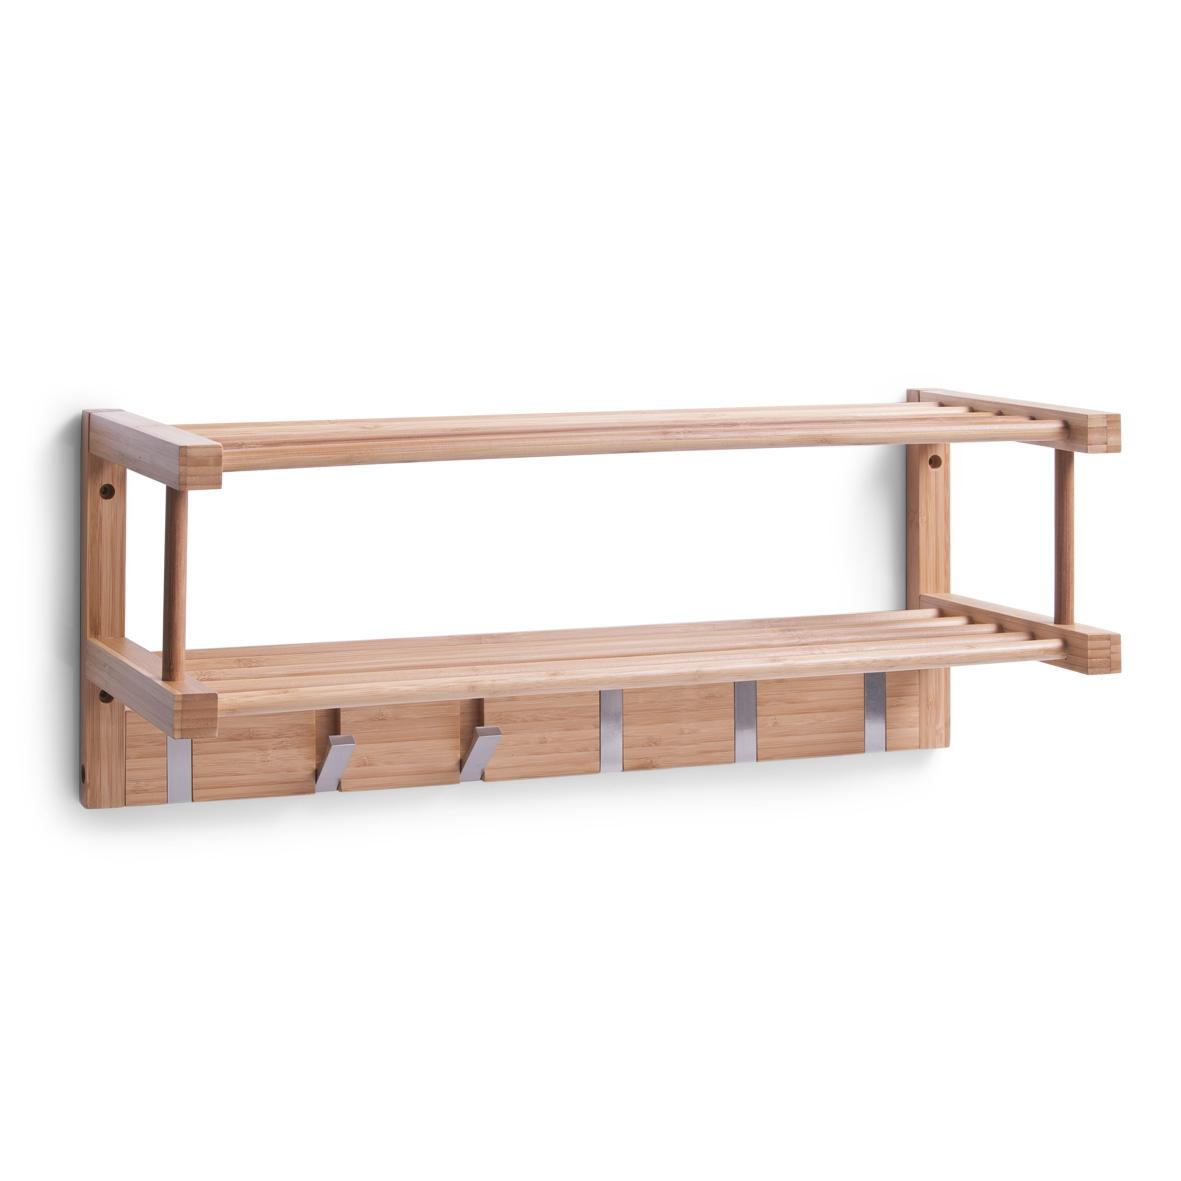 Cuier cu 2 etajere, Bamboo Natural, l60xA24xH24 cm